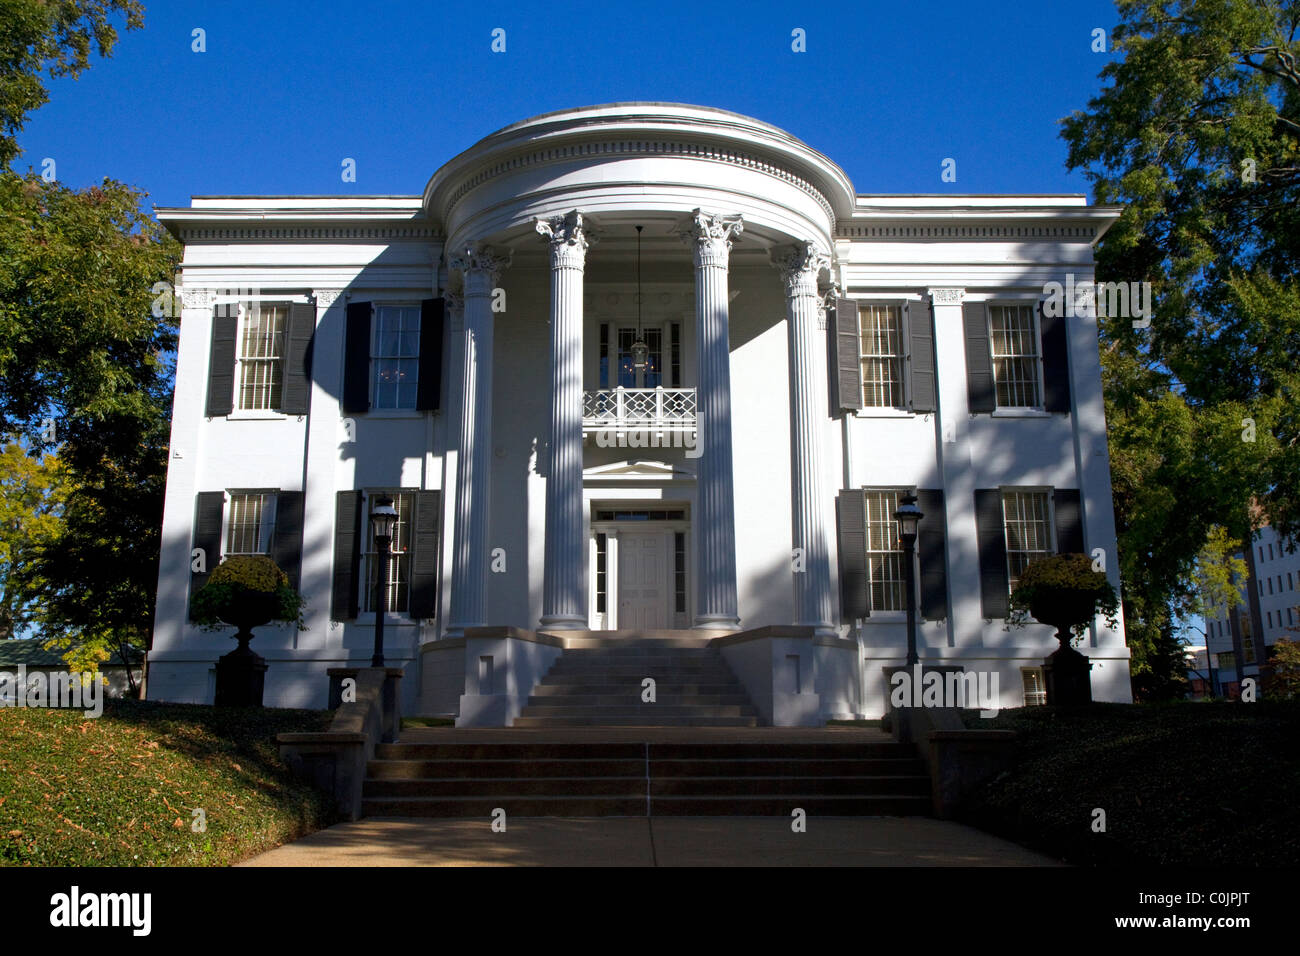 The Mississippi Governor's Mansion in Jackson, Mississippi, USA. - Stock Image